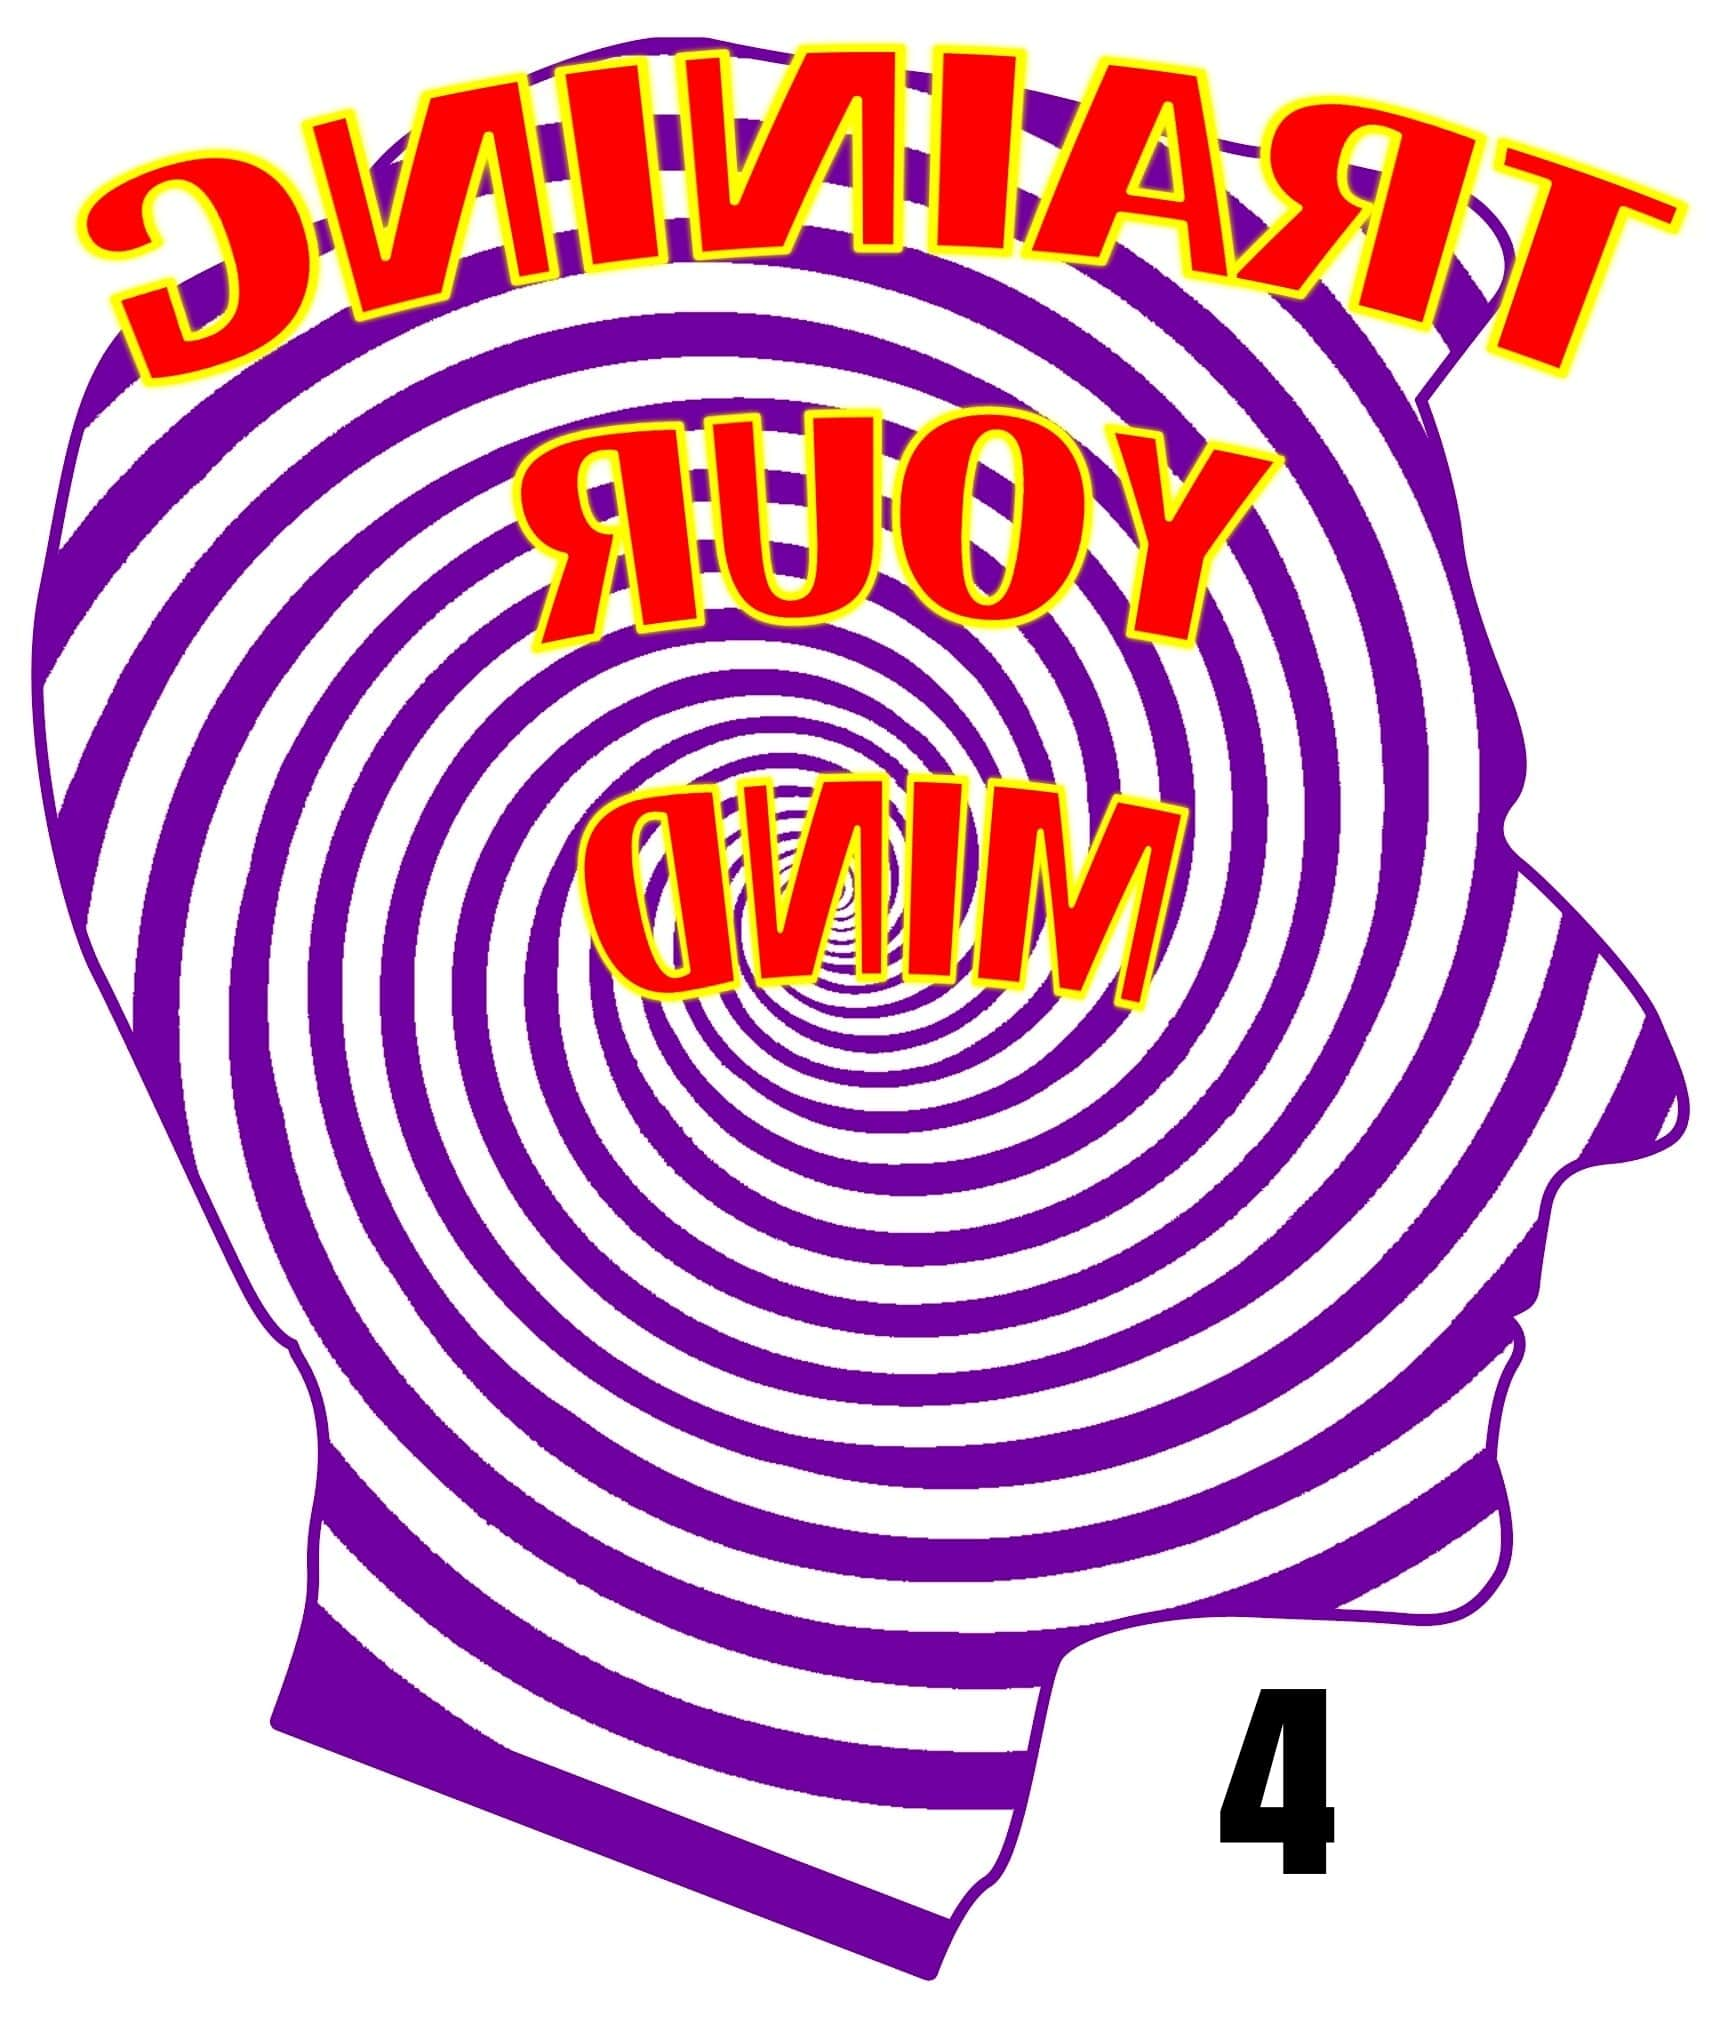 Training your mind 4